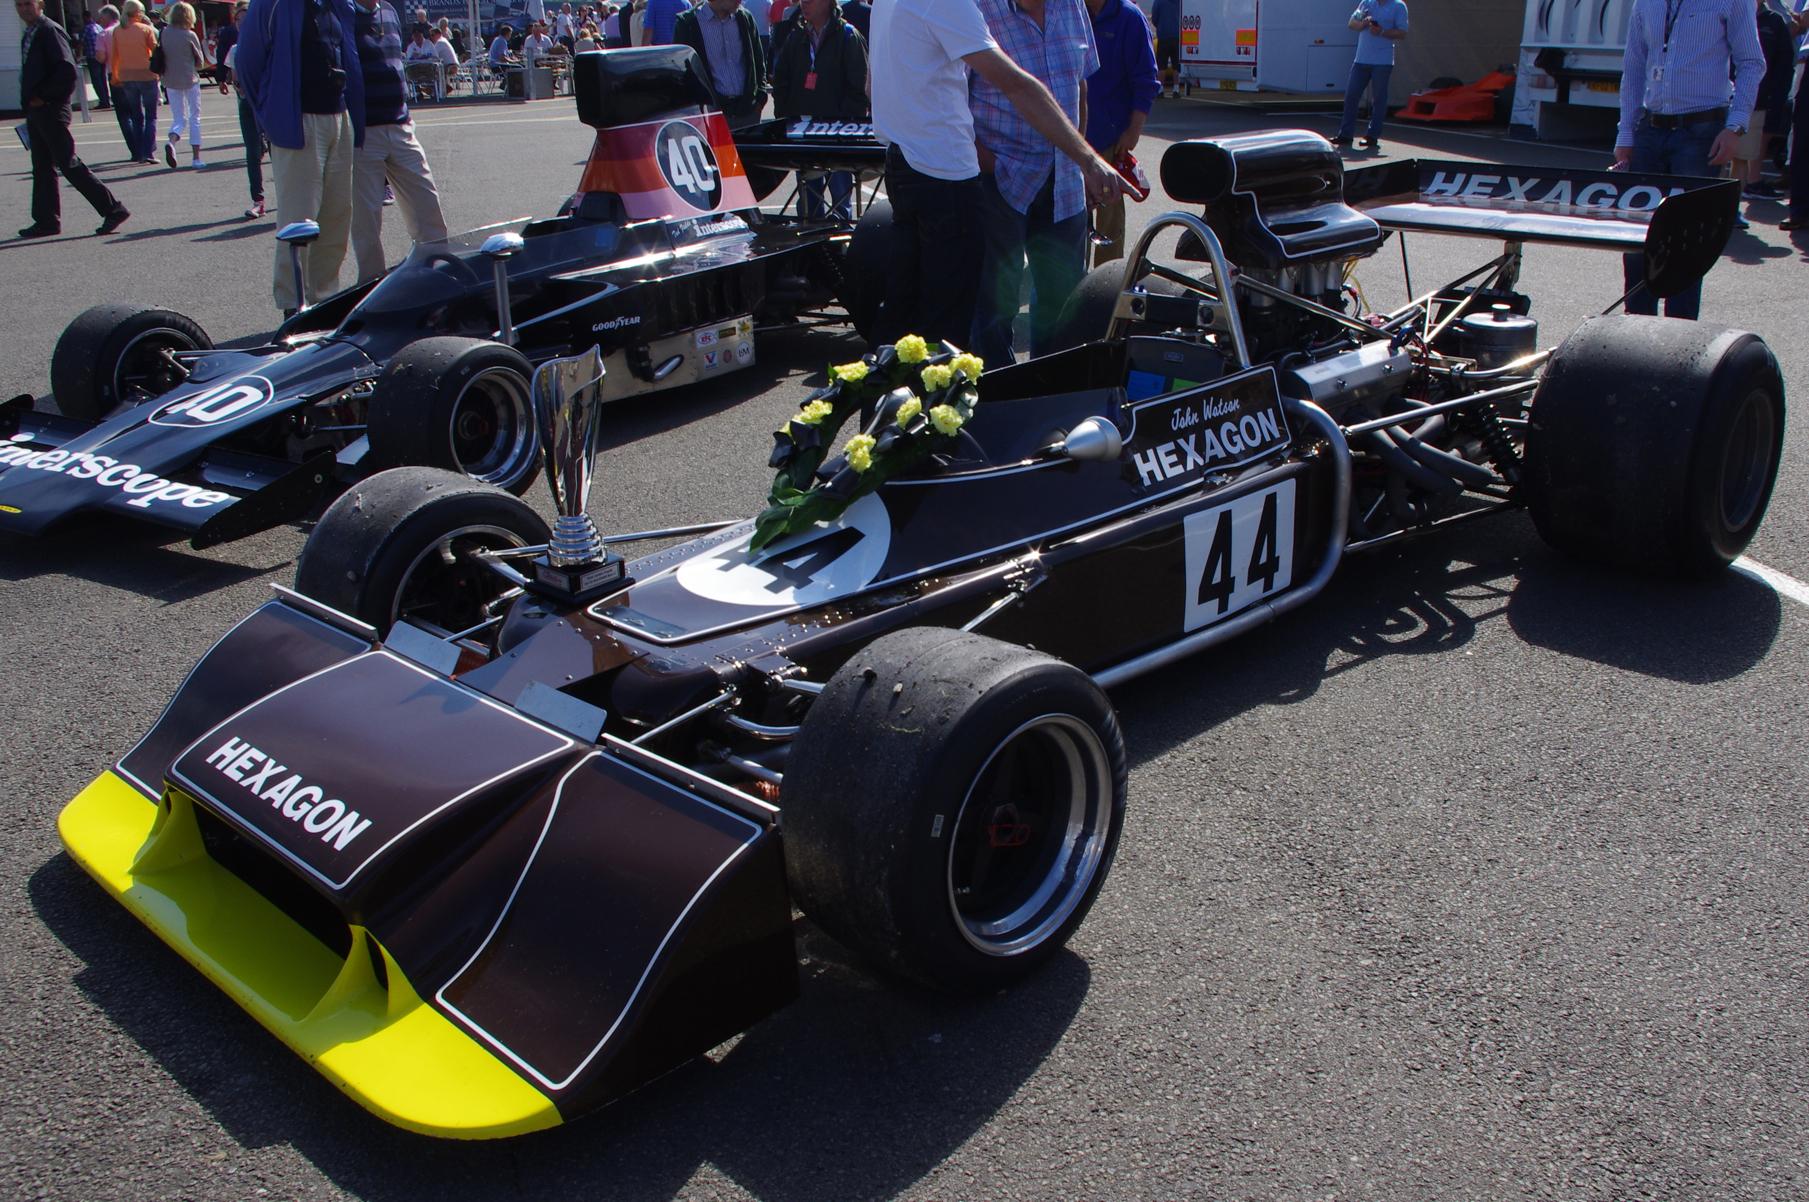 Trojan Tauranac Racing Wikipedia